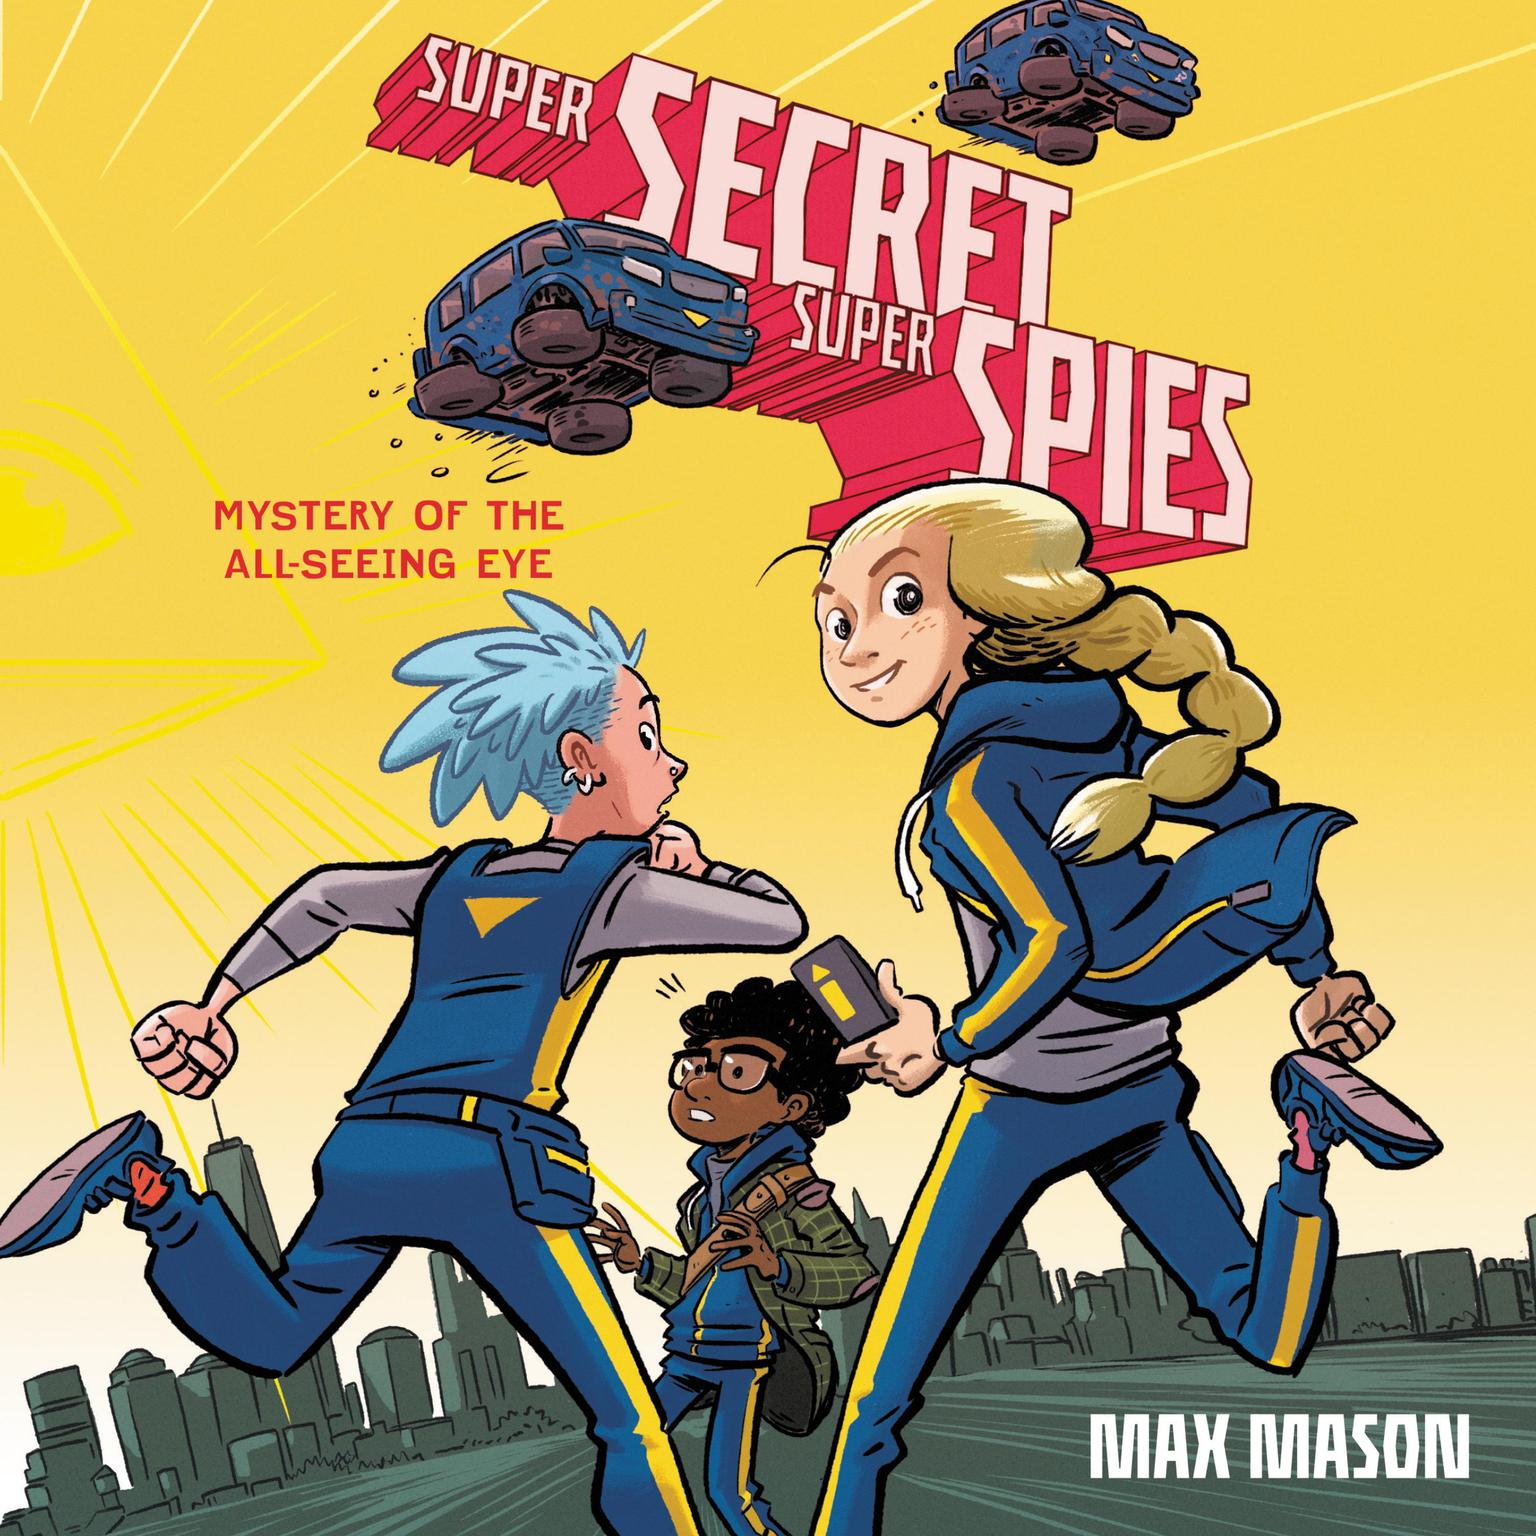 Super Secret Super Spies: Mystery of the All-Seeing Eye: Mystery of the All-Seeing Eye  Audiobook, by Max Mason